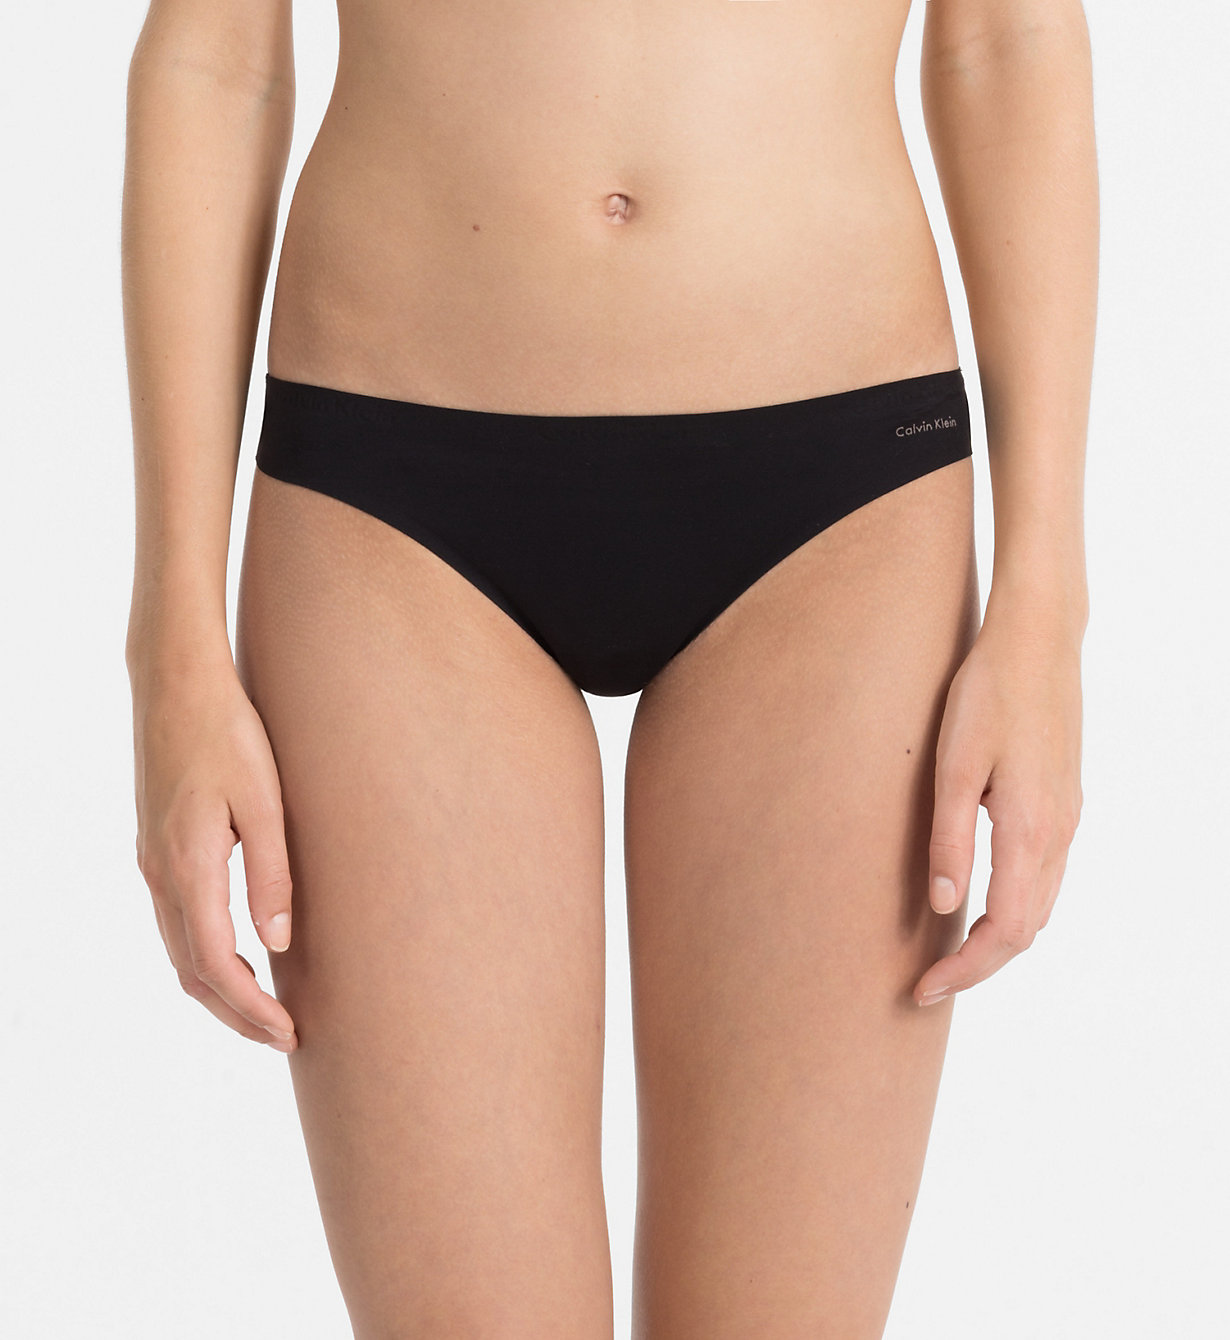 Tanga F3842E černá - Calvin Klein Barva: černá, Velikost: S